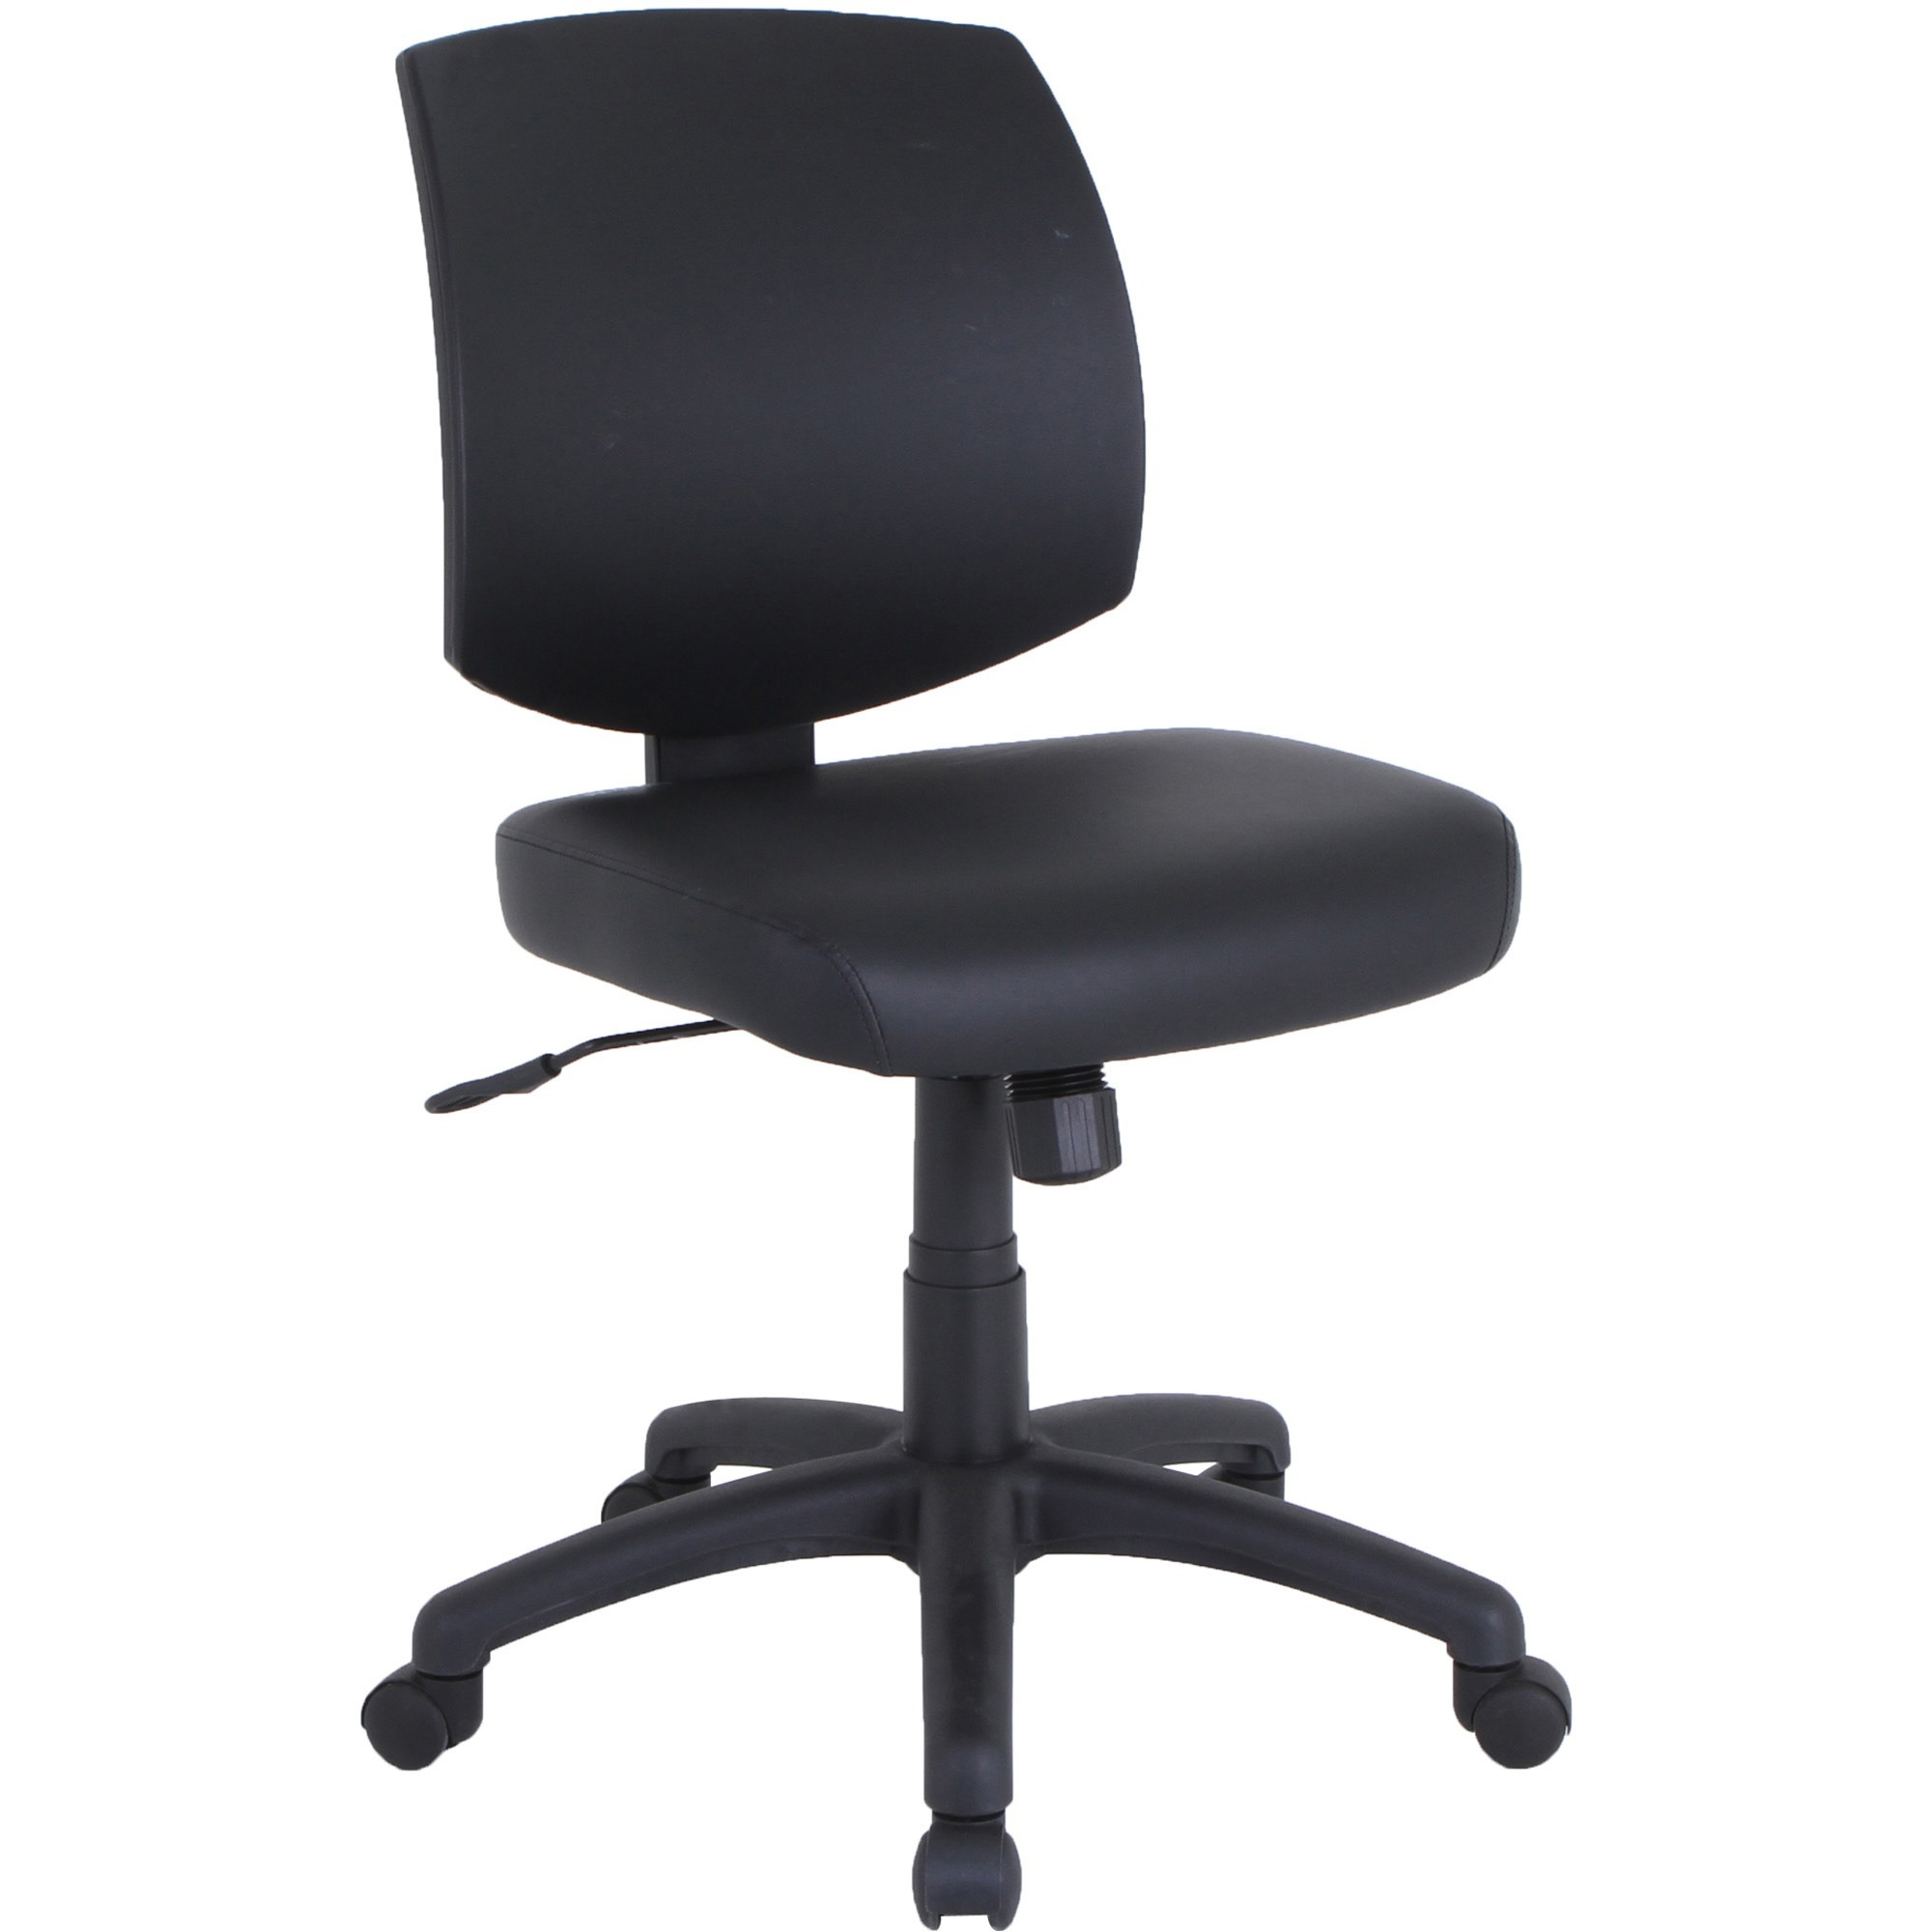 Lorell PVC UpholsteryTask Chair - Polyvinyl Chloride (PVC) Seat - Polyvinyl Chloride (PVC) Back - 5-star Base - Black - 18.88